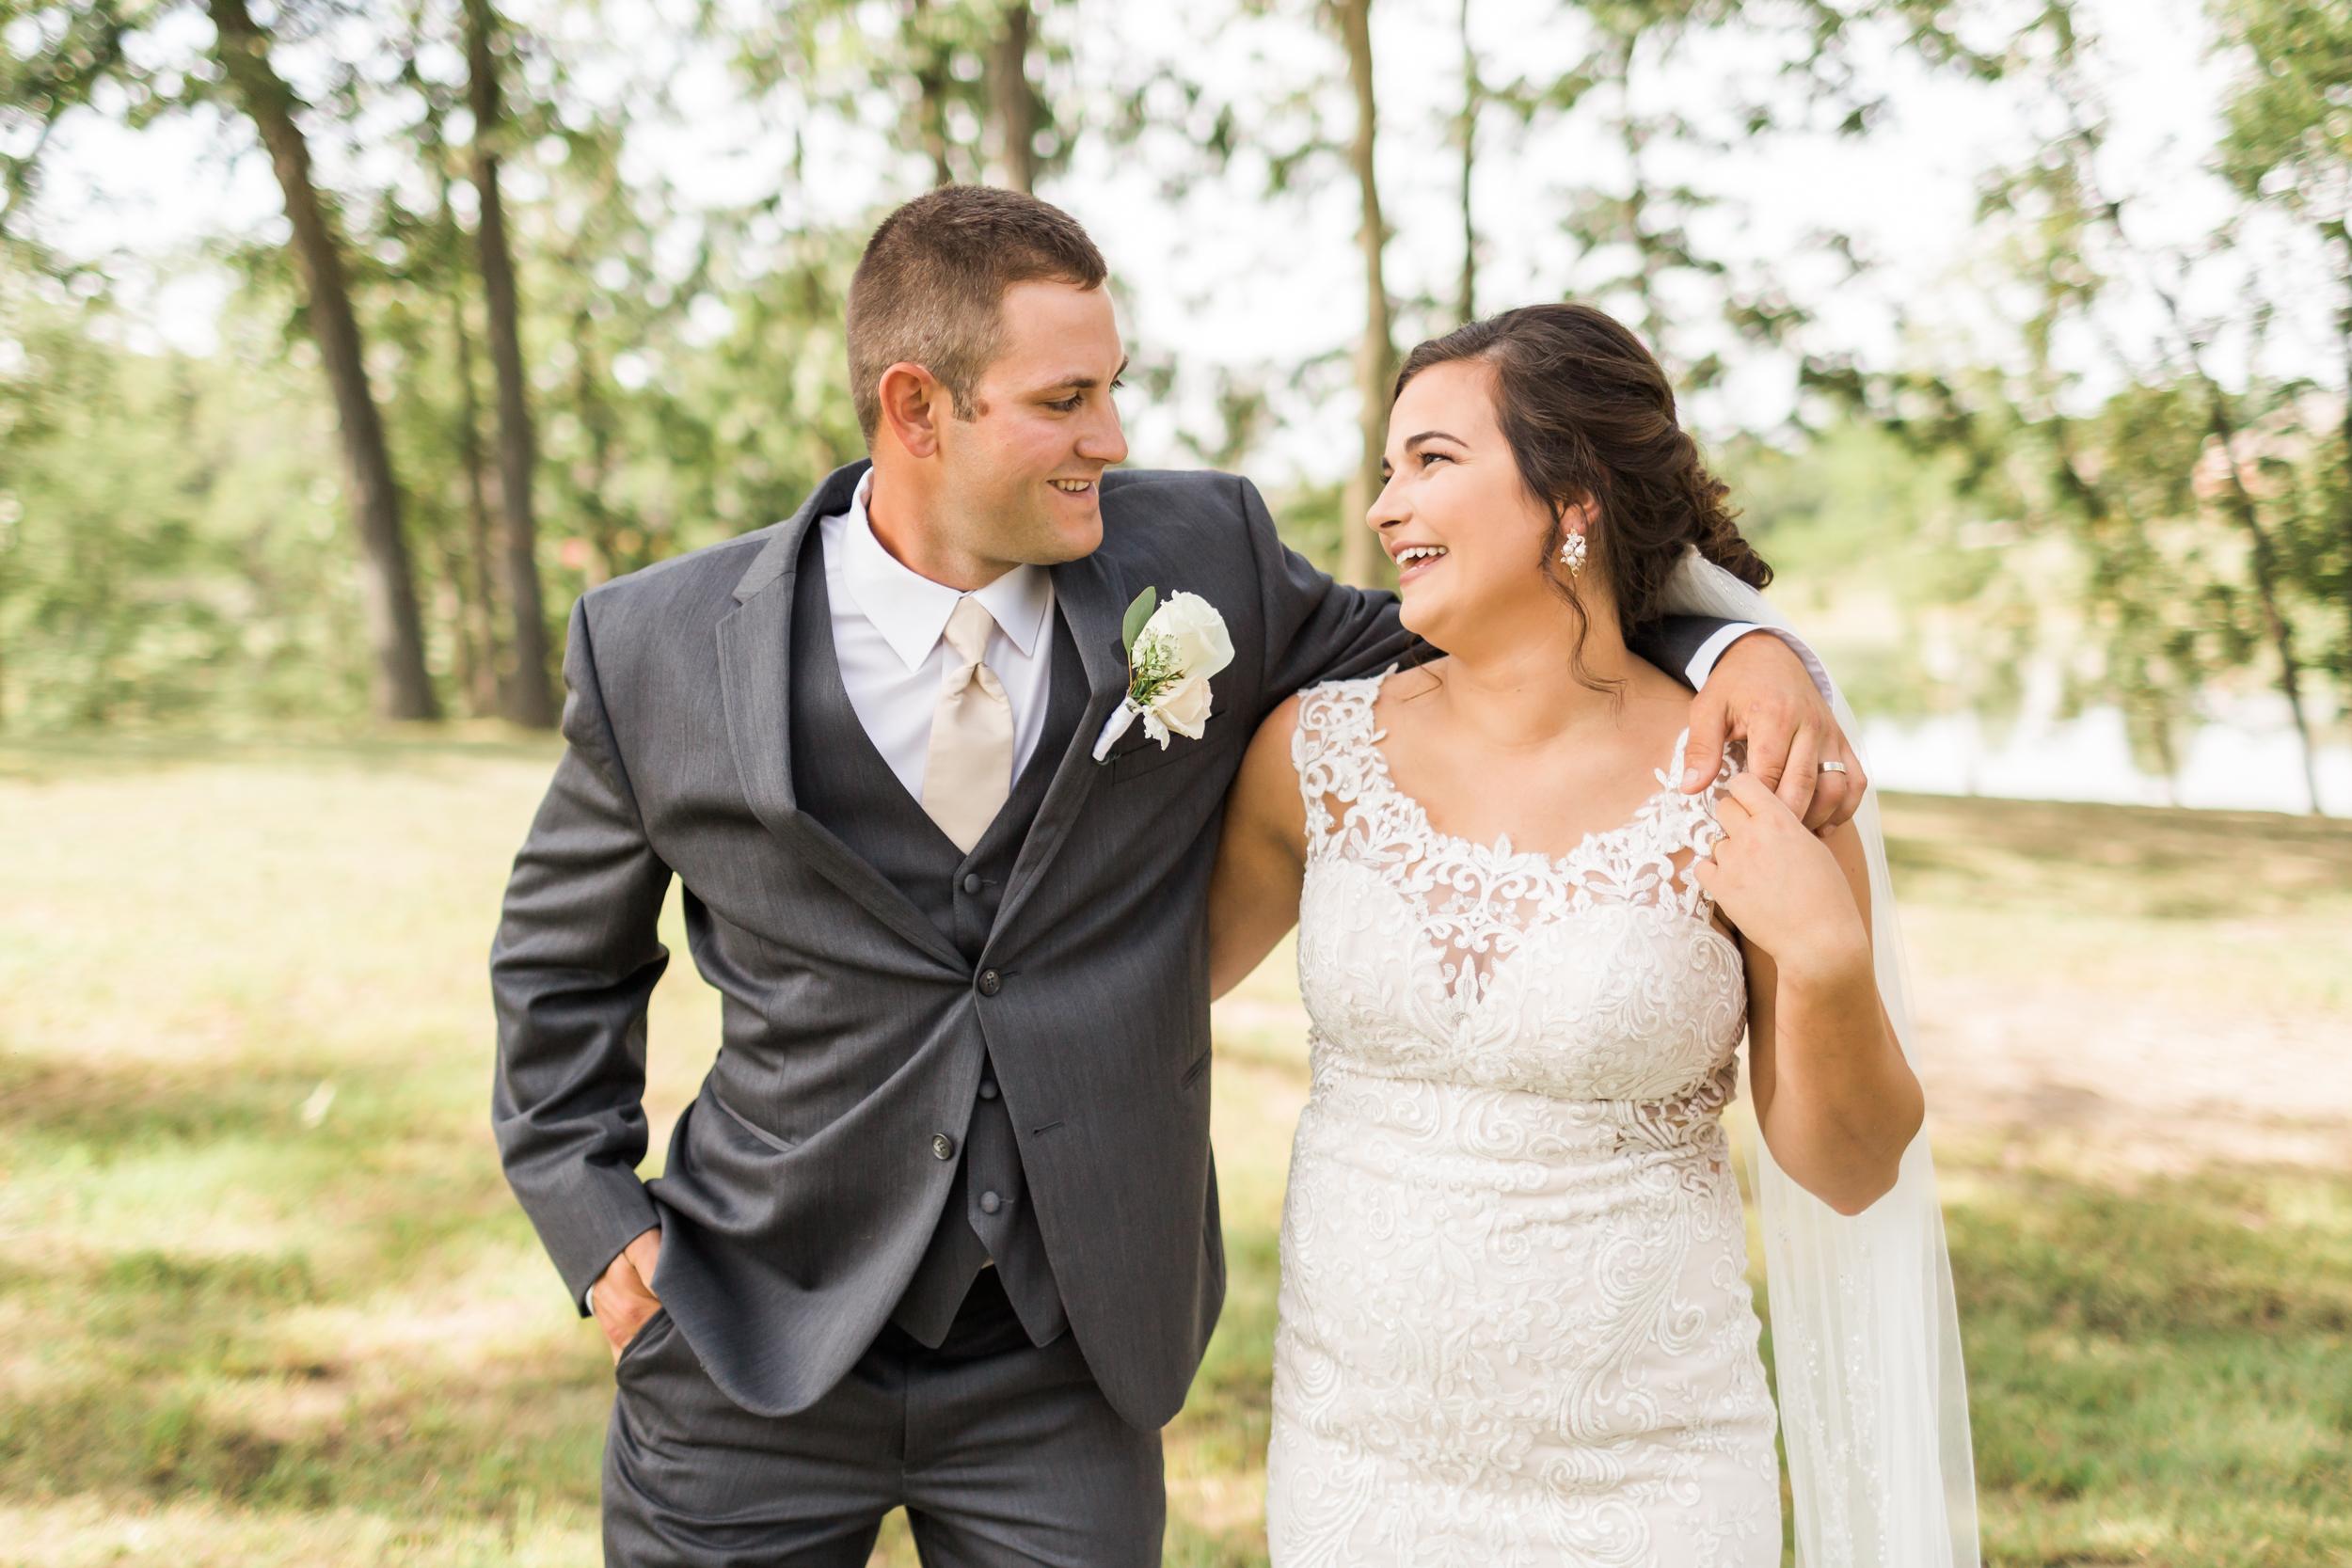 romanticcountrywedding--40.jpg